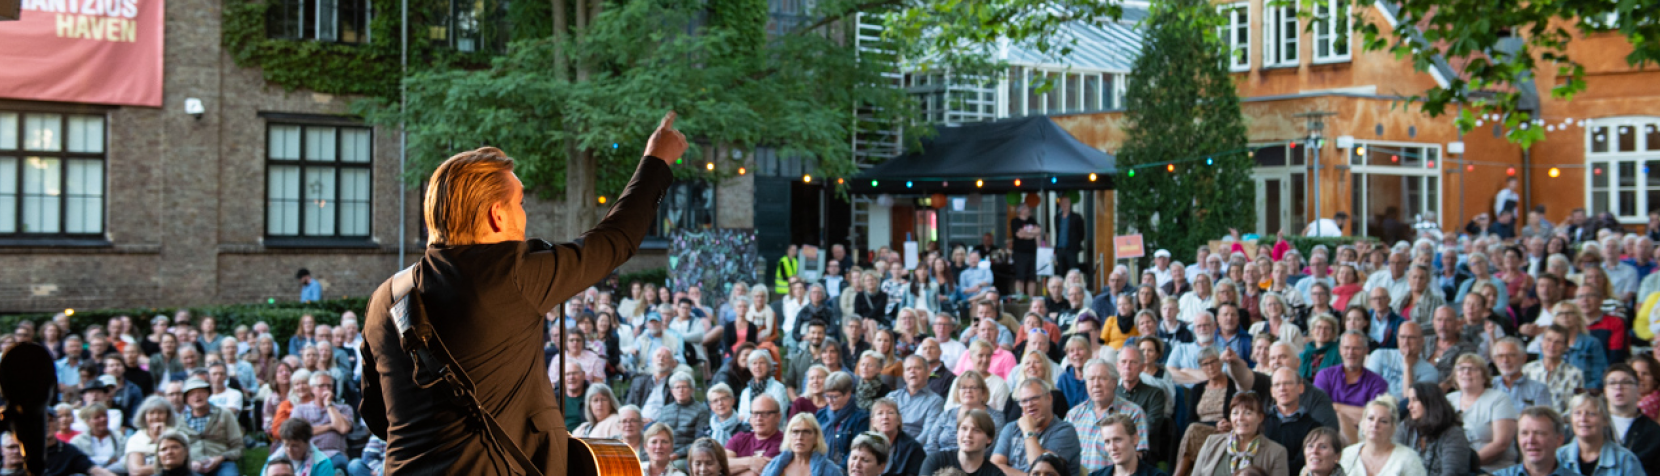 Jacob Dinesen koncert i Mantzius Haven